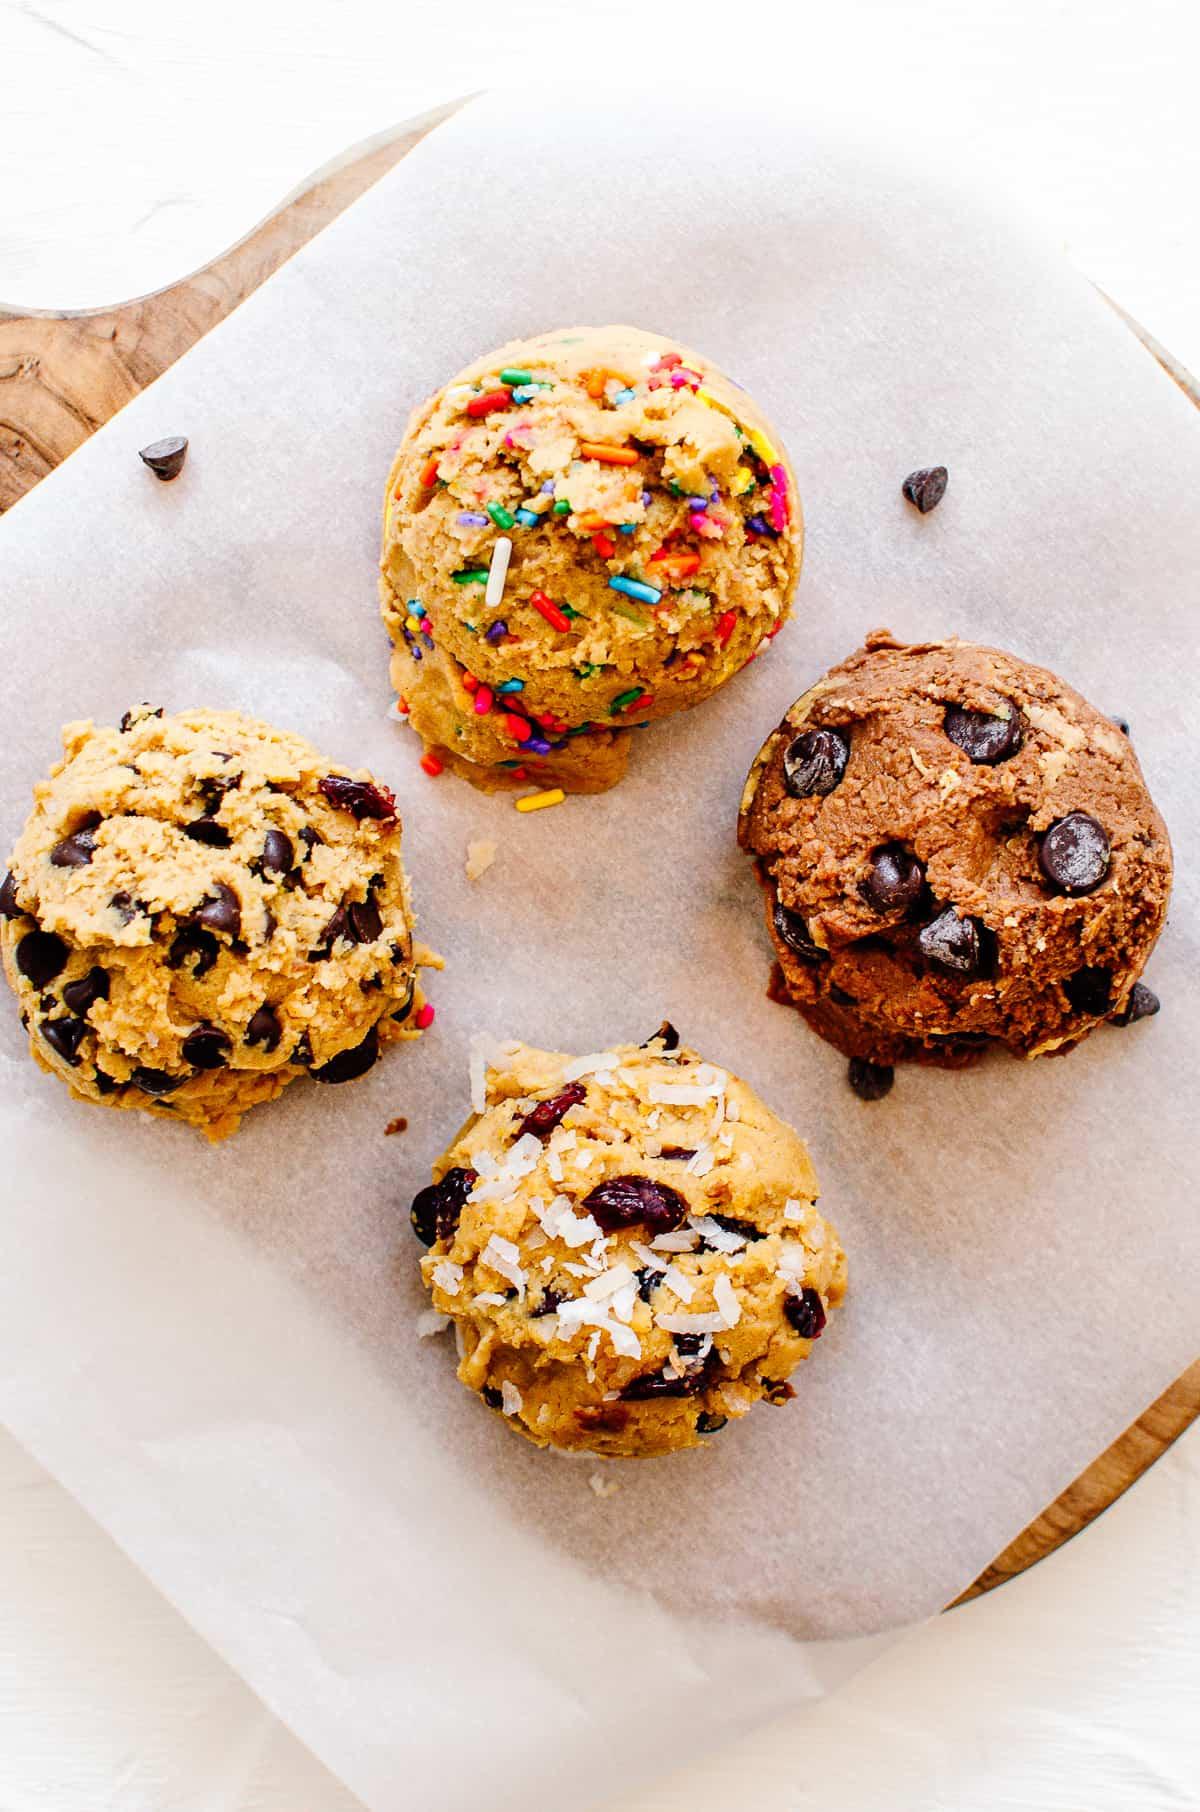 Four cookie dough balls for each flavour.